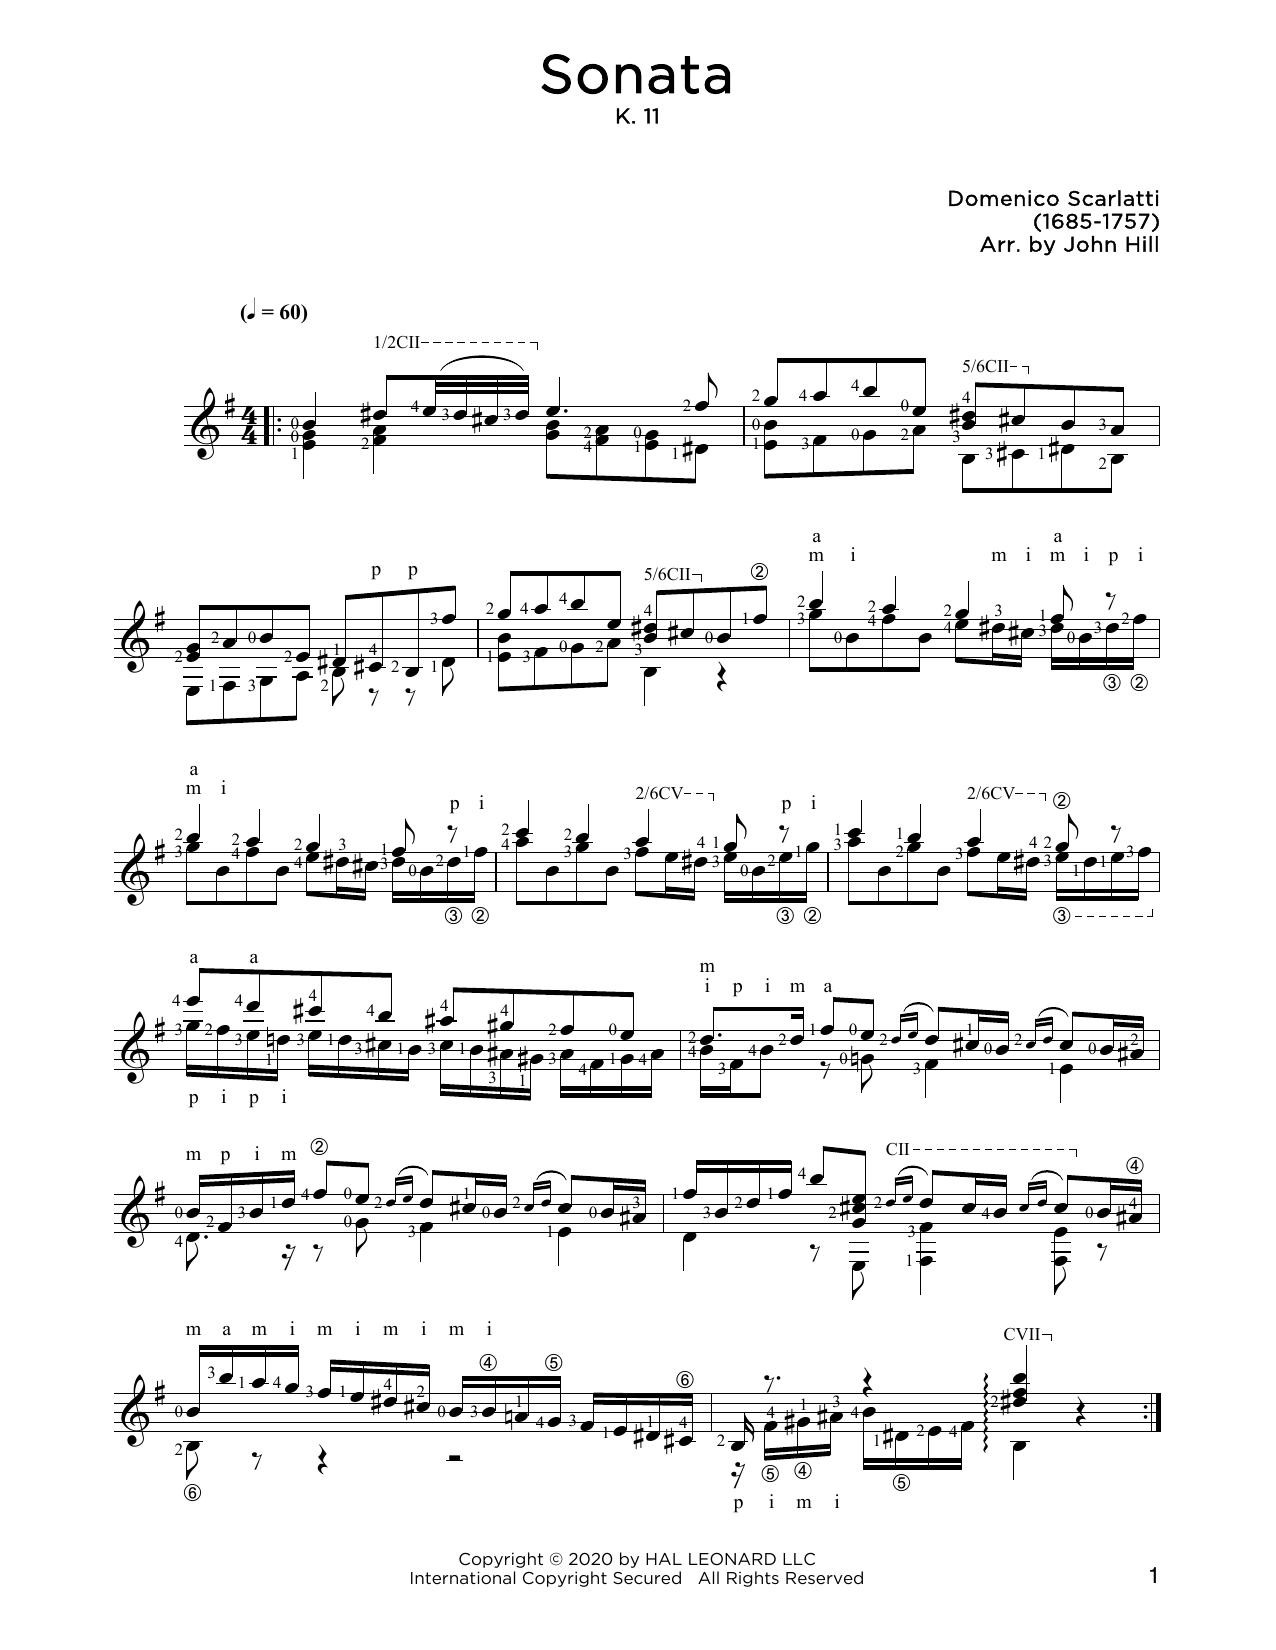 Domenico Scarlatti Sonata, L. 352 sheet music notes and chords. Download Printable PDF.